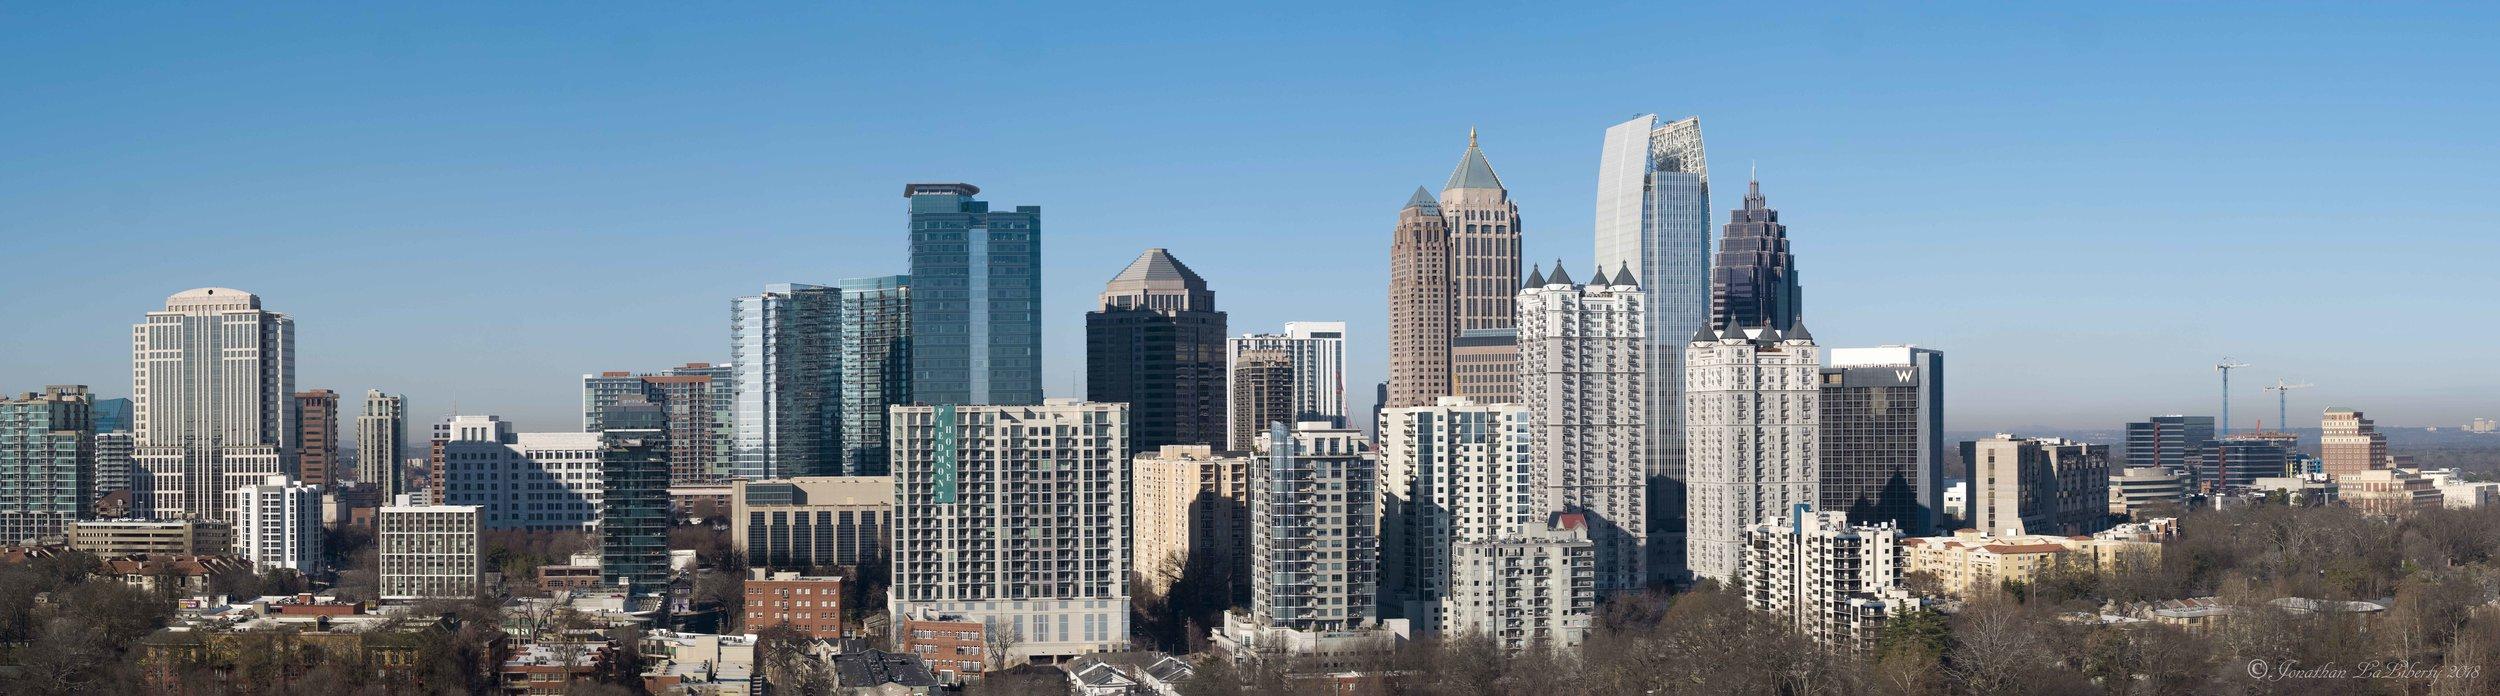 Midtown Atlanta Drone Photography Architecture